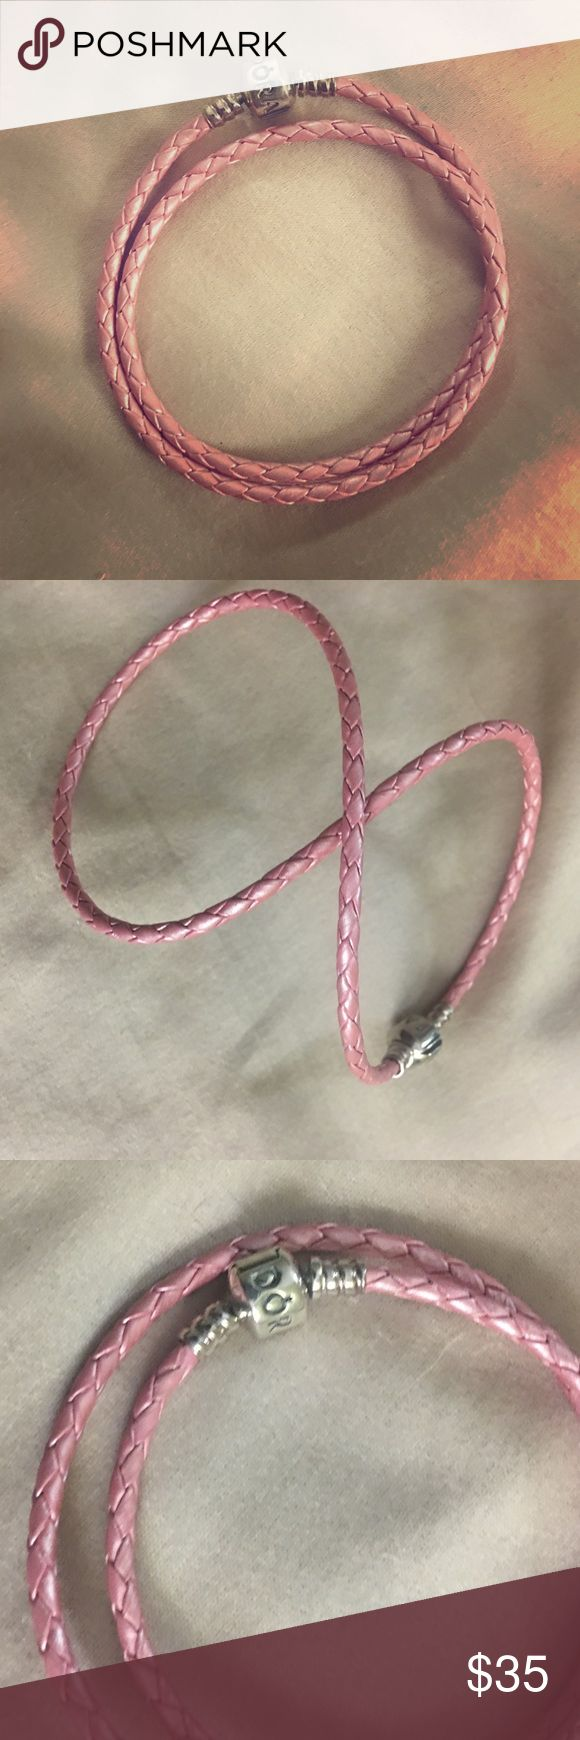 "Pandora Leather Bracelet ""Authentic""  Pink leather Pandora bracelet, gently used and purchased at a Pandora store. Pandora Jewelry Bracelets"